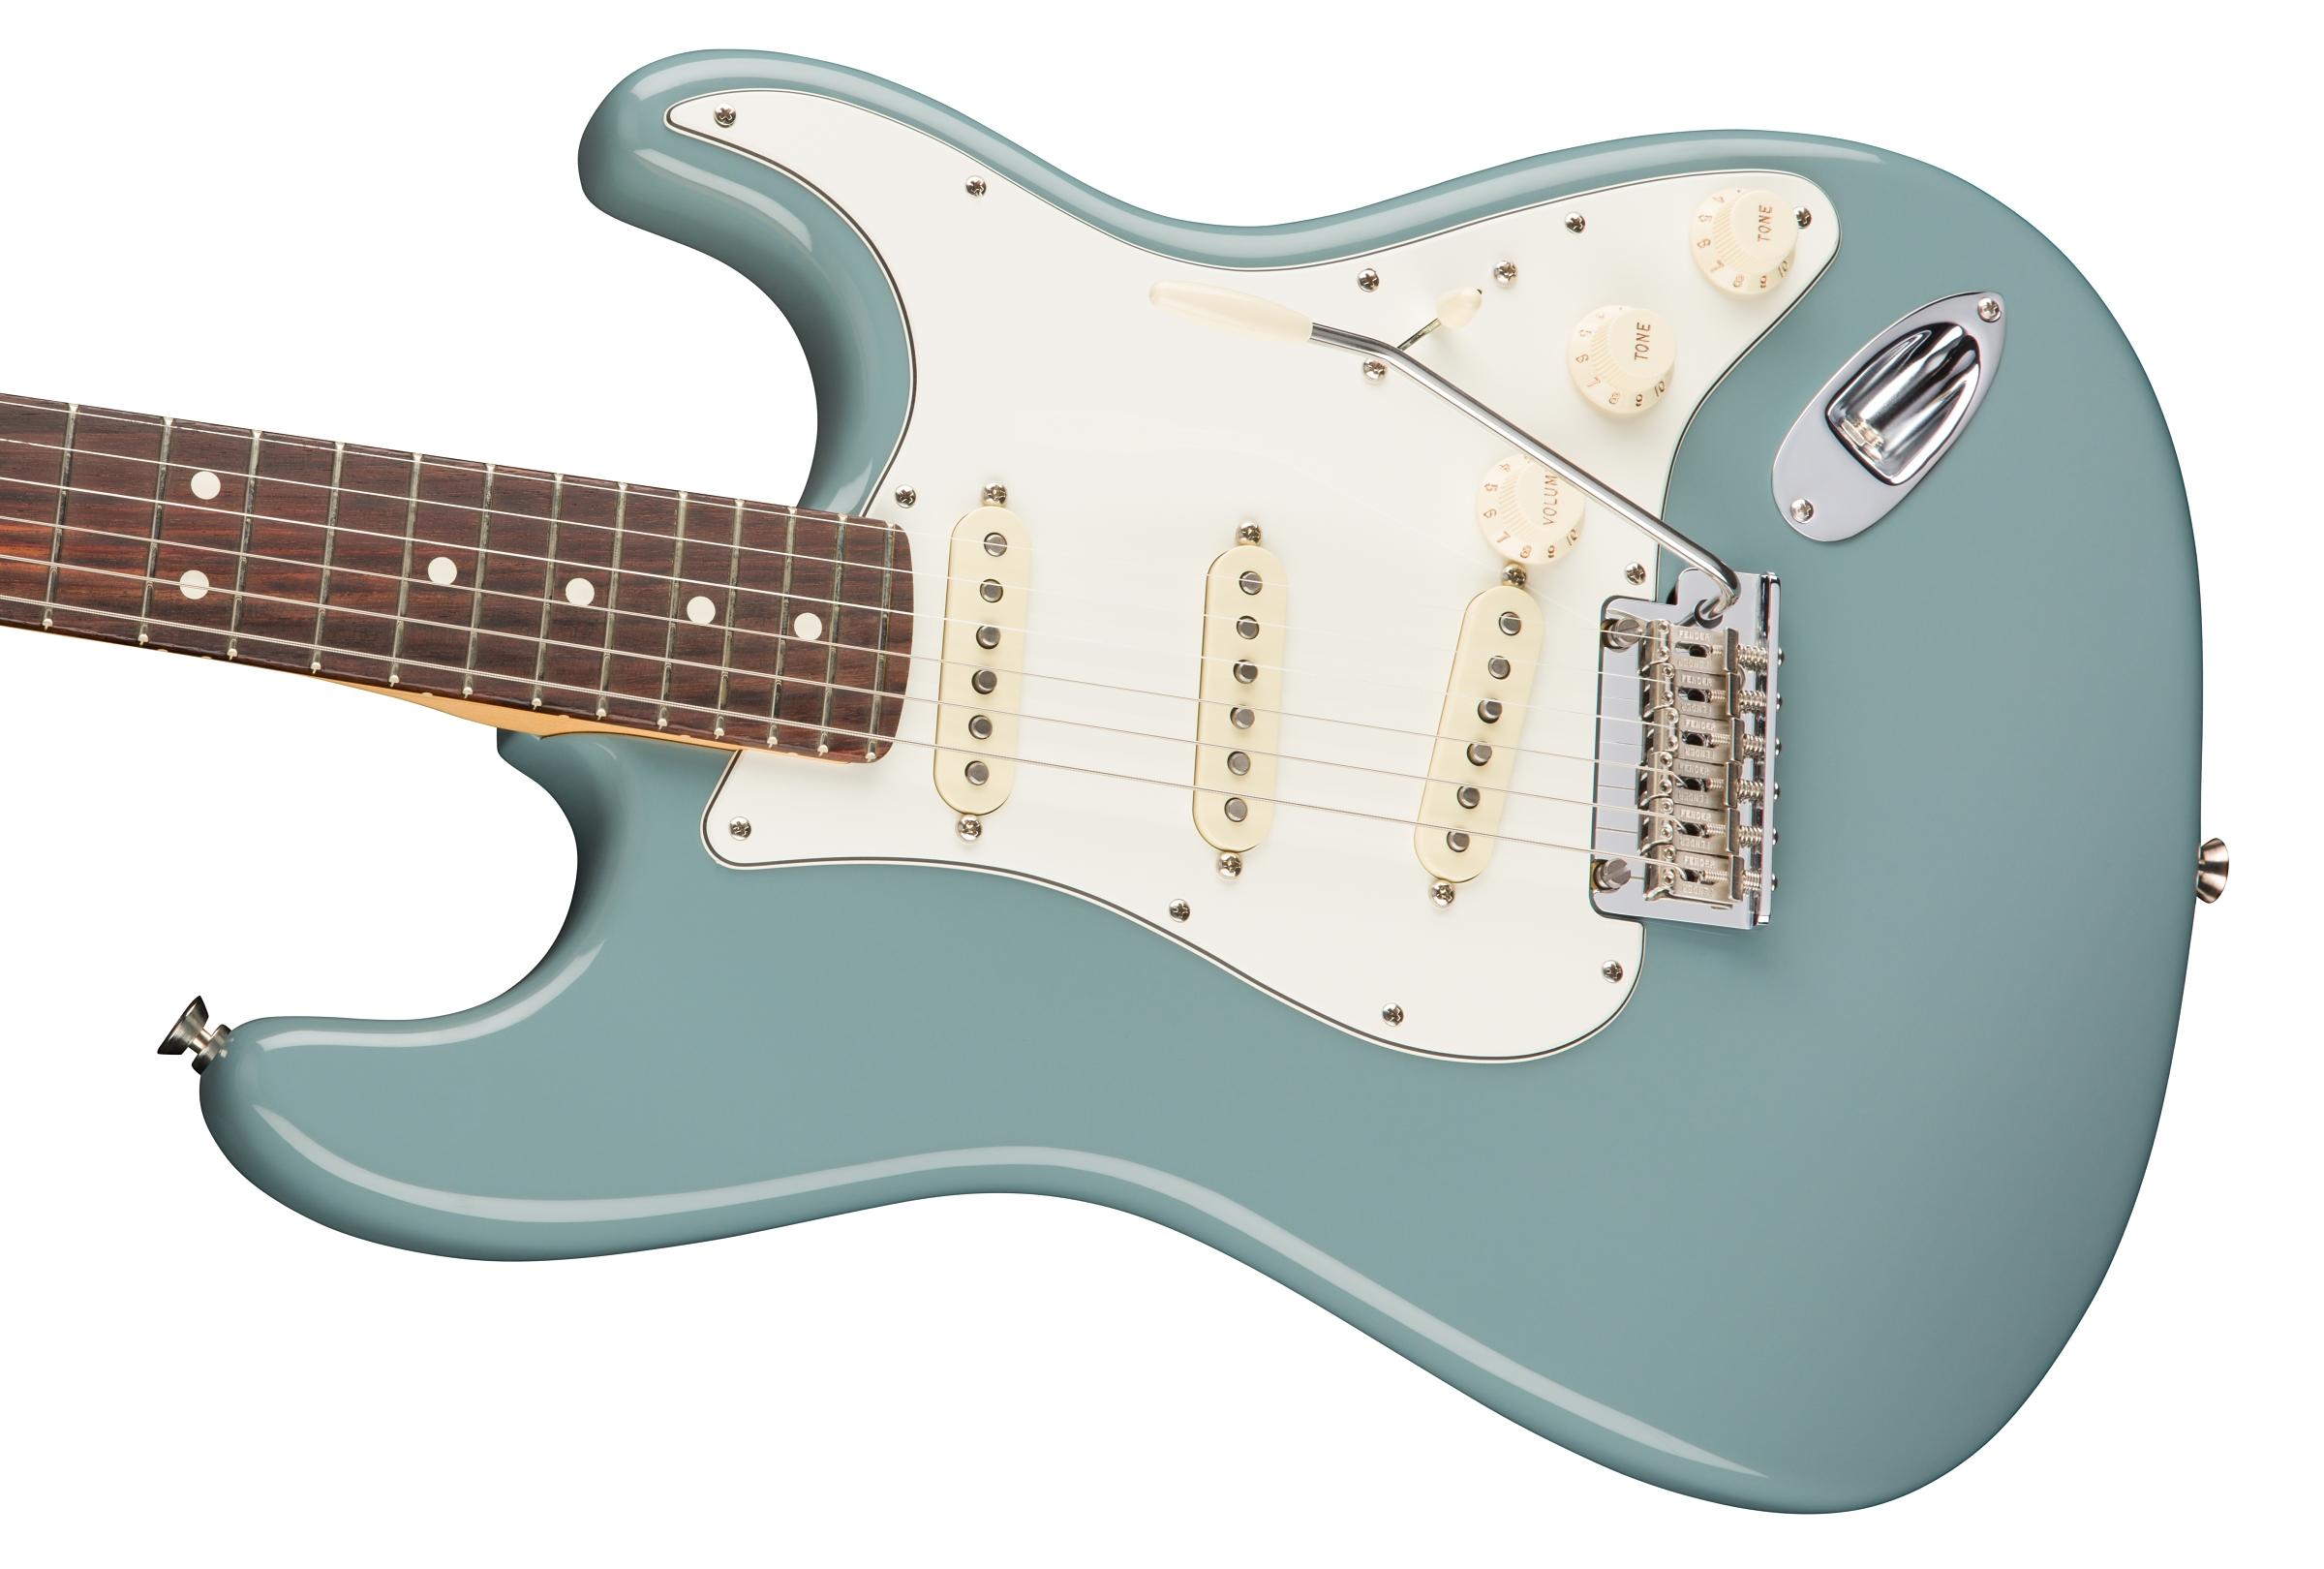 Fender American Professional Stratocaster®